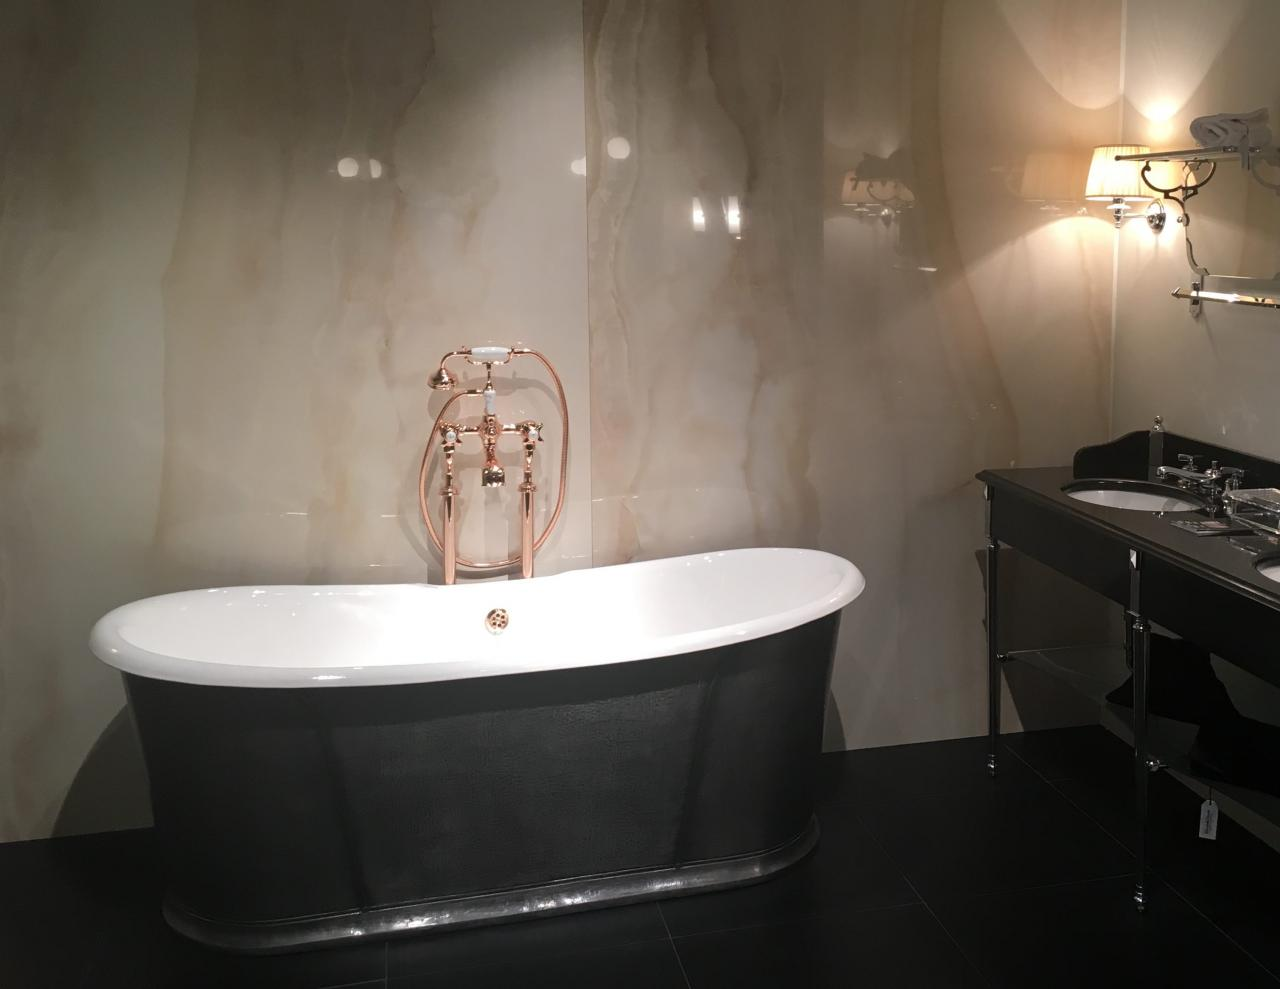 Vasca Da Bagno Usata Prezzi : Vasca da bagno guida alla scelta fratelli pellizzari